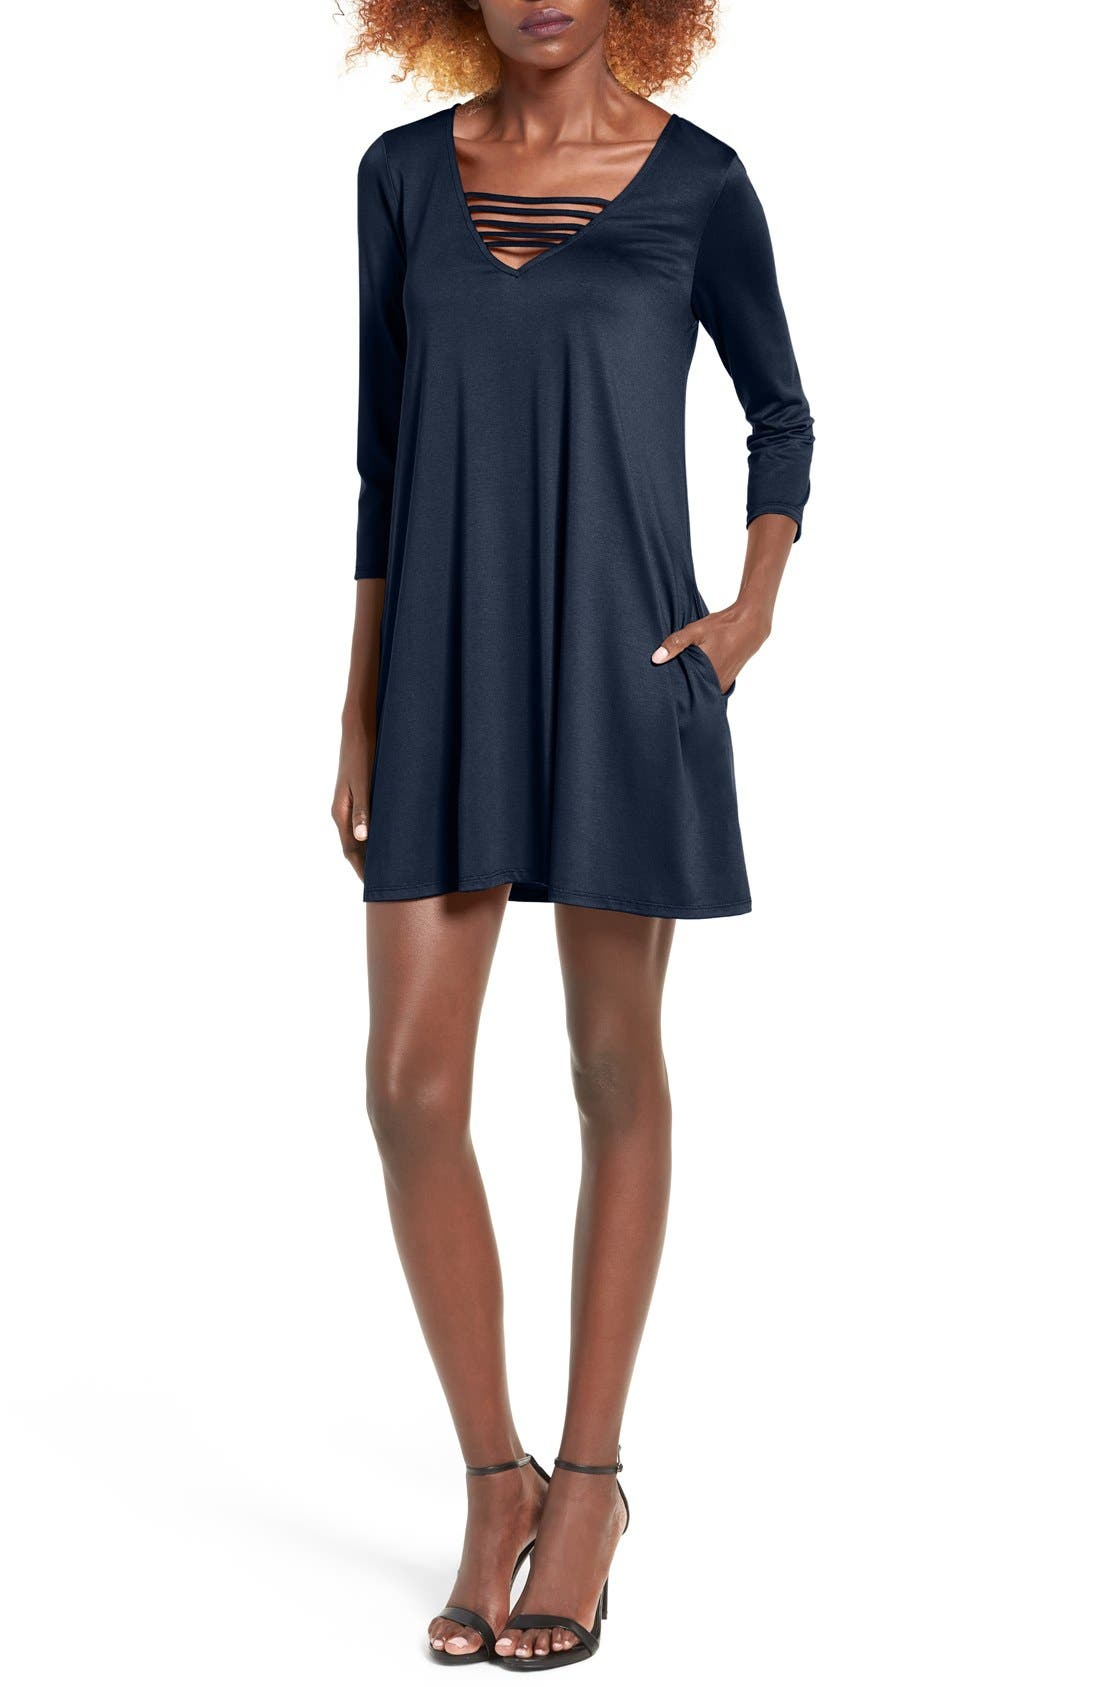 Alternate Image 1 Selected - Socialite Serena Three Quarter Sleeve Dress